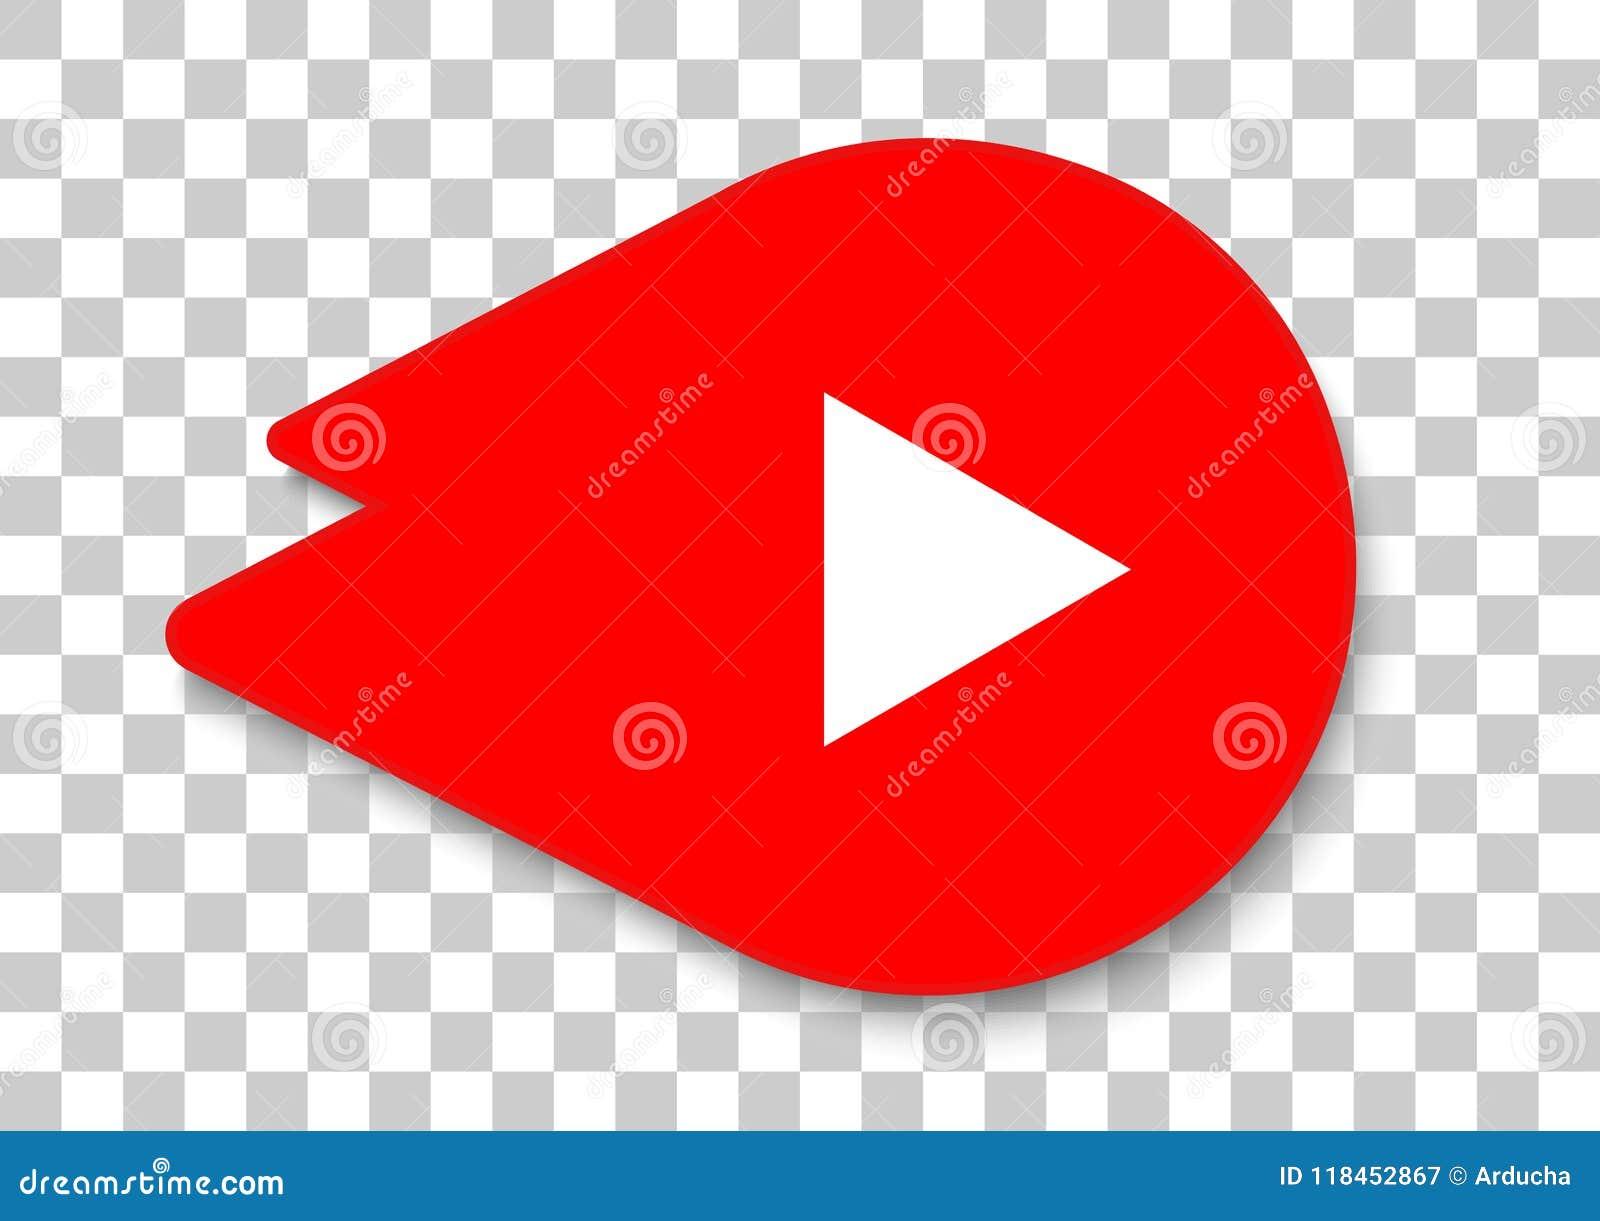 Youtube go icon apk editorial photography  Illustration of